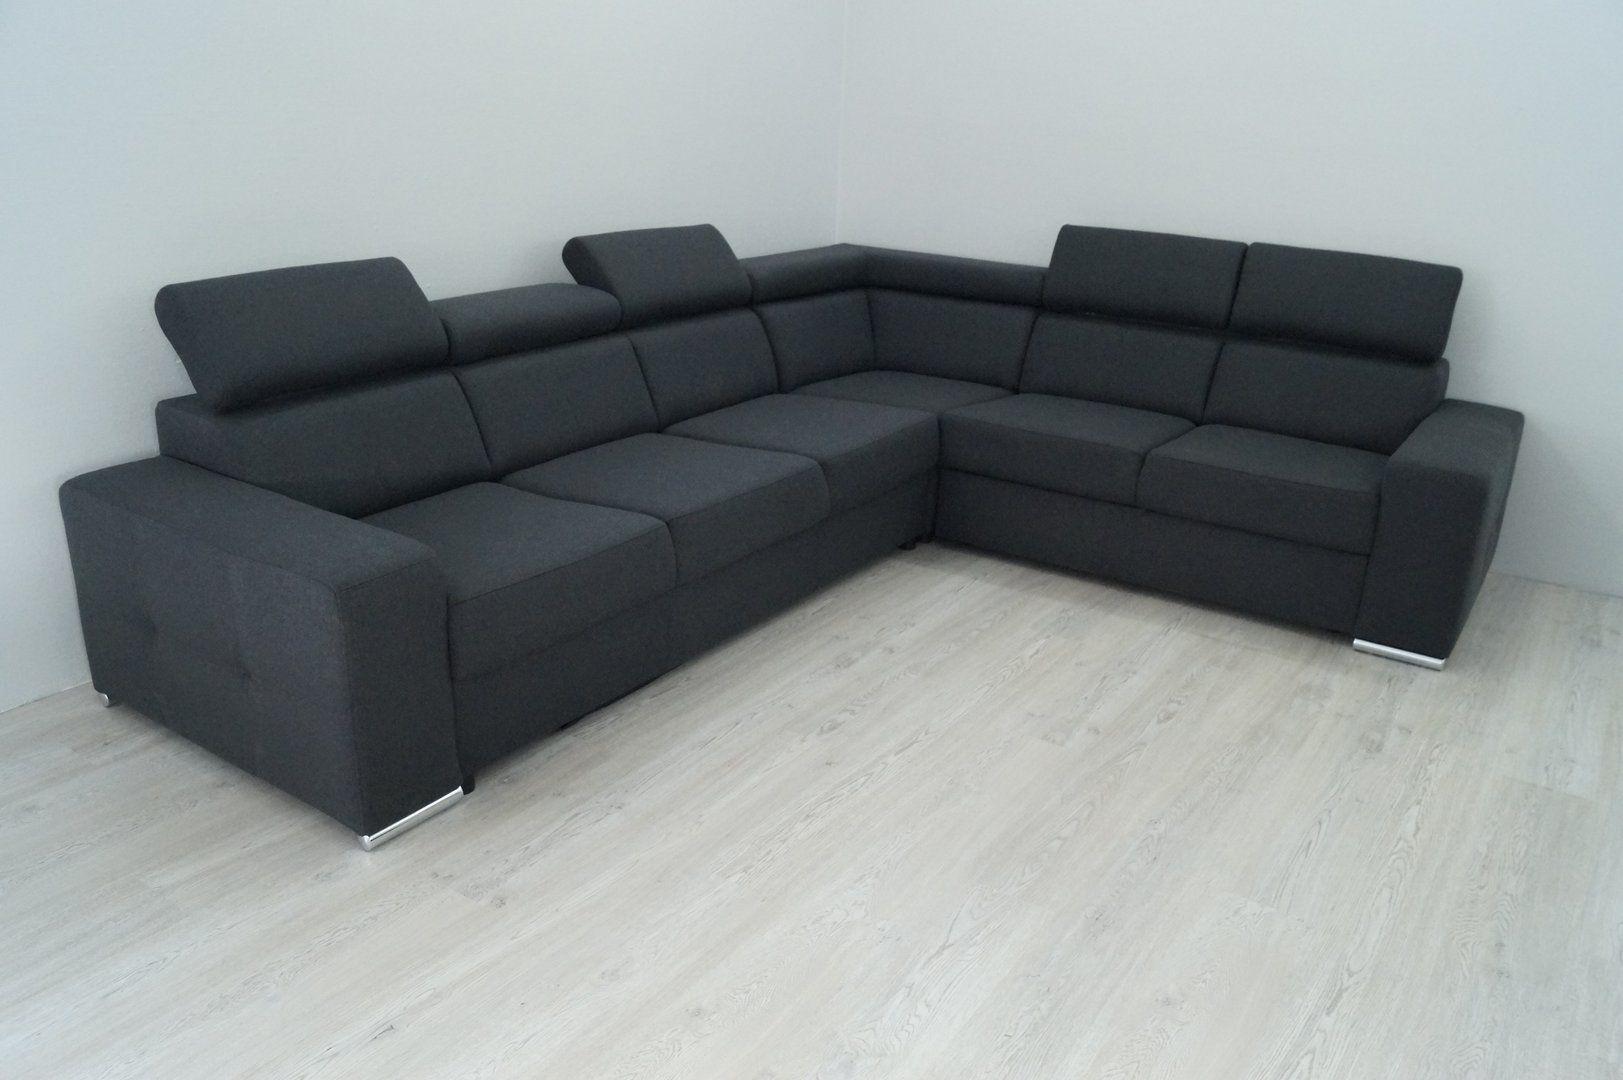 Sofa Lagerverkauf Www Sofa Lagerverkauf De Billige Mobel Hausmobel